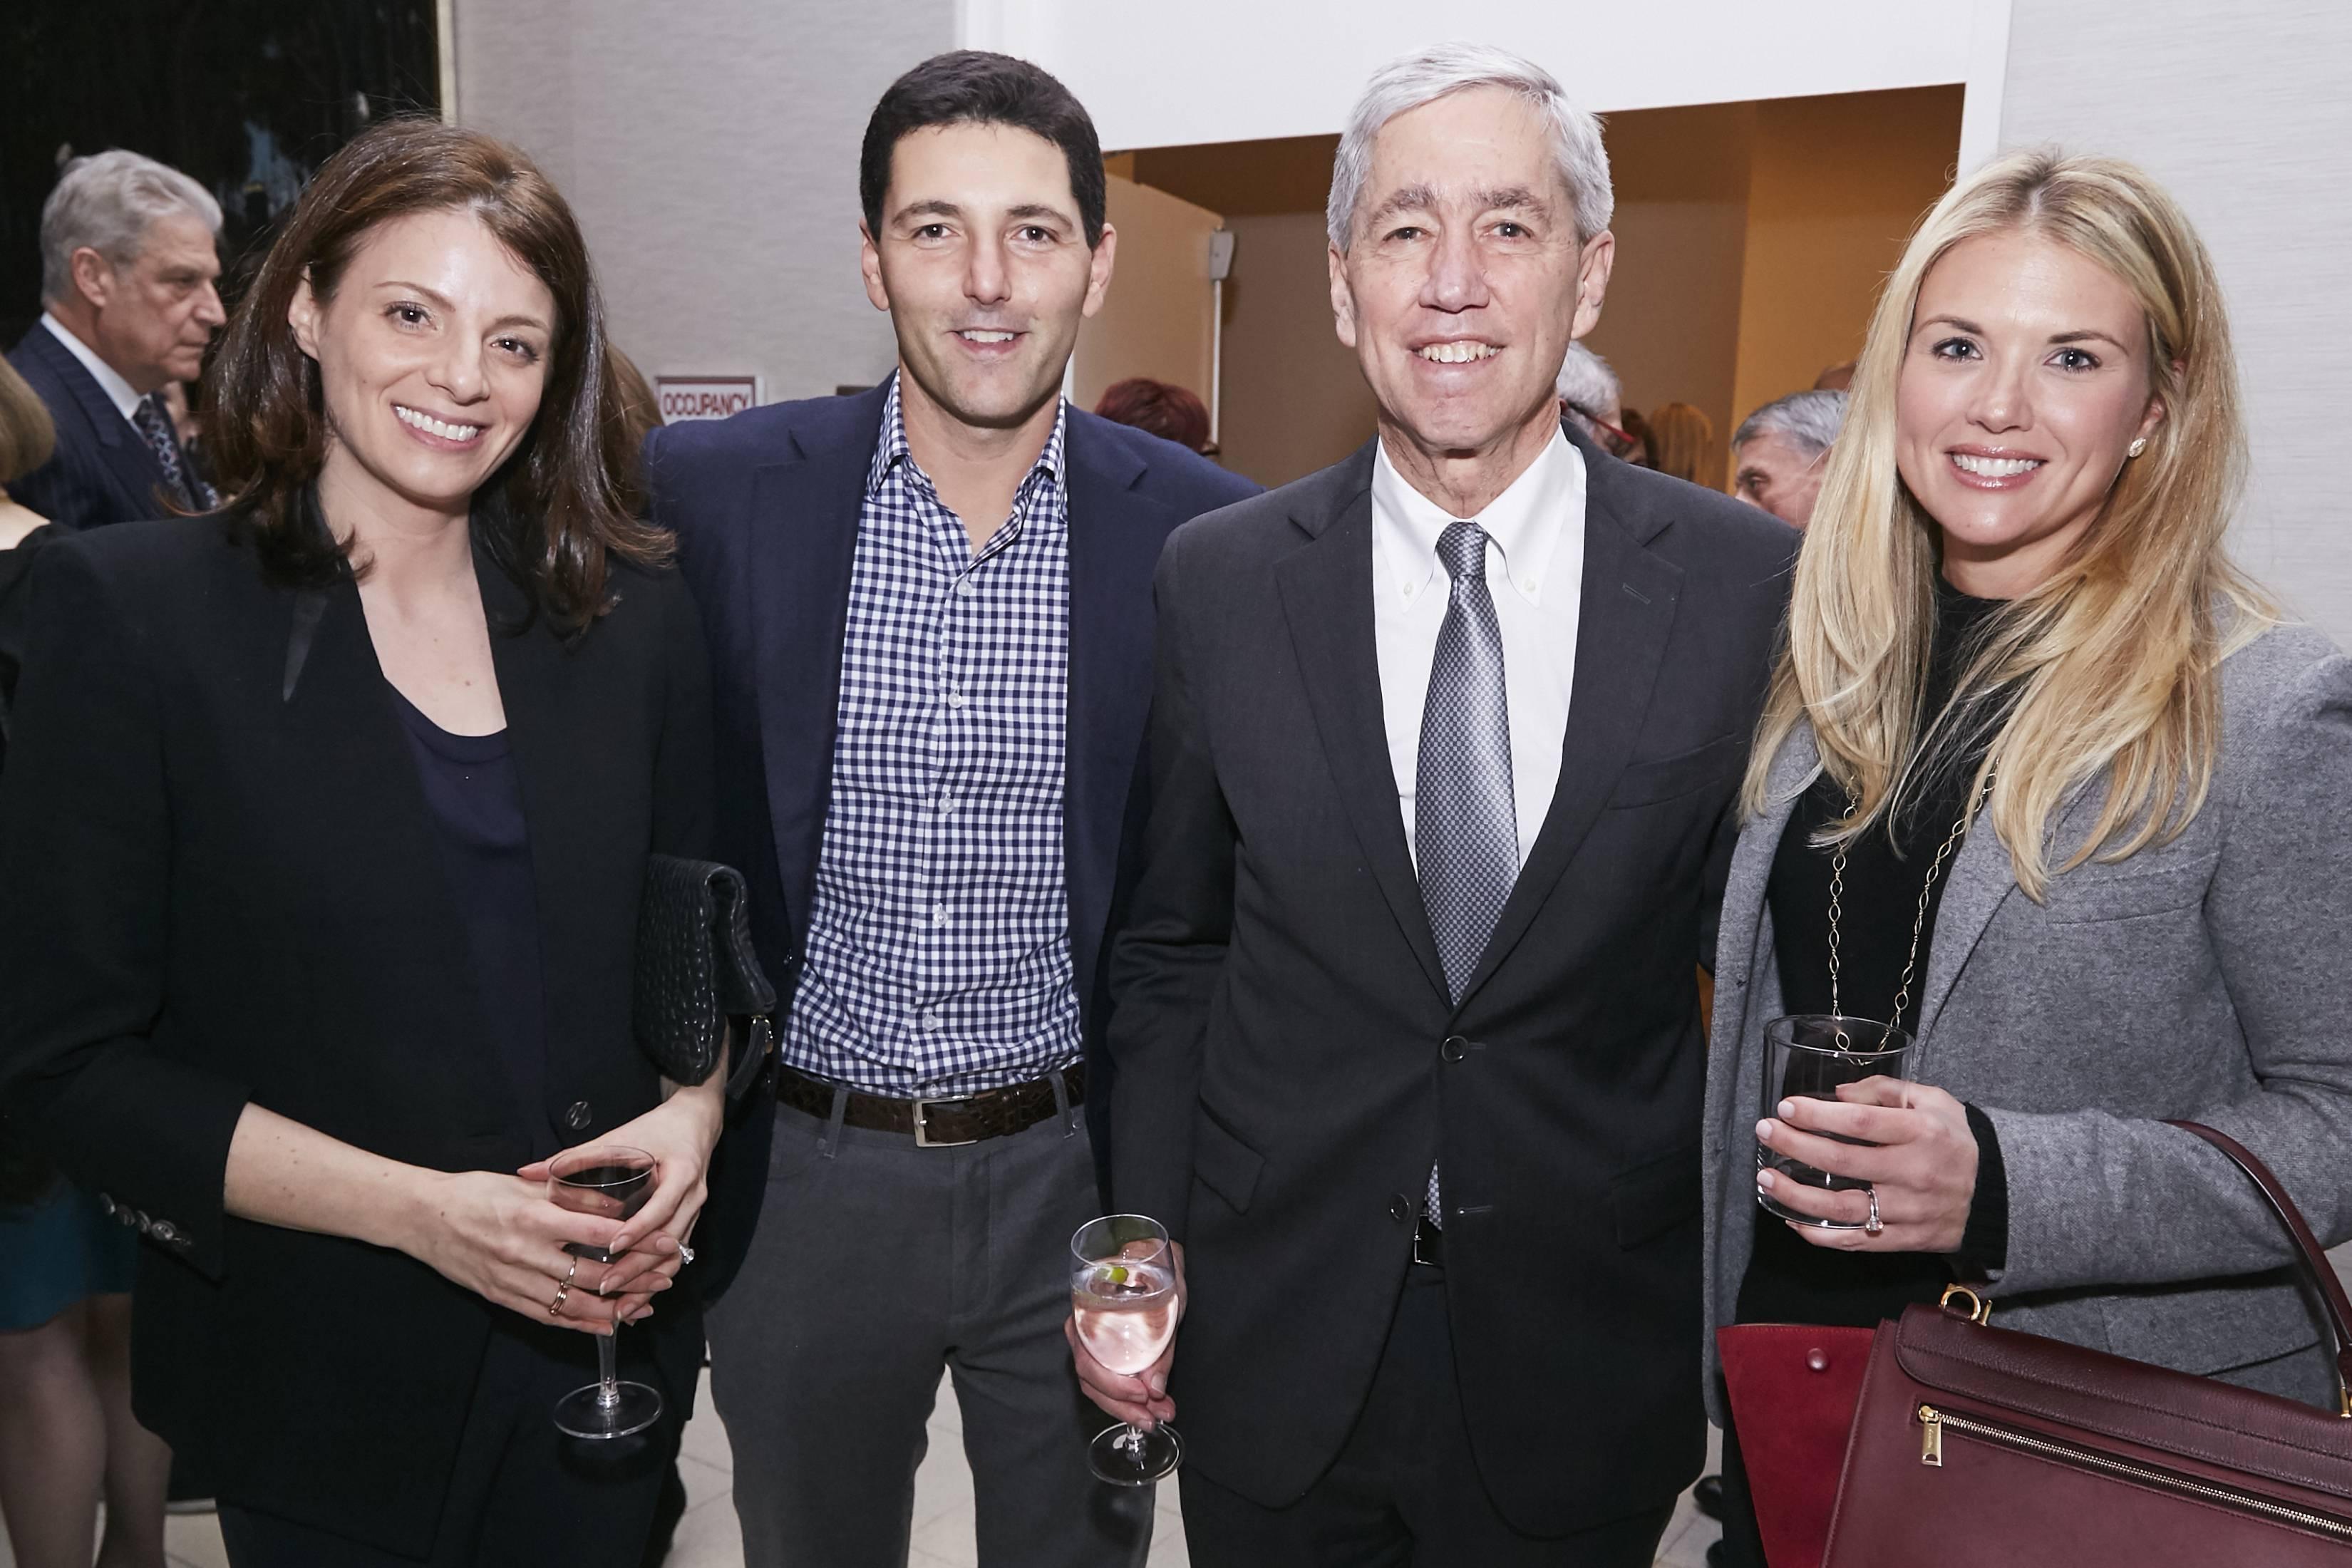 Lauren Breslow, Jonathan Korngold, Rick Lifton, and Kristy Korngold